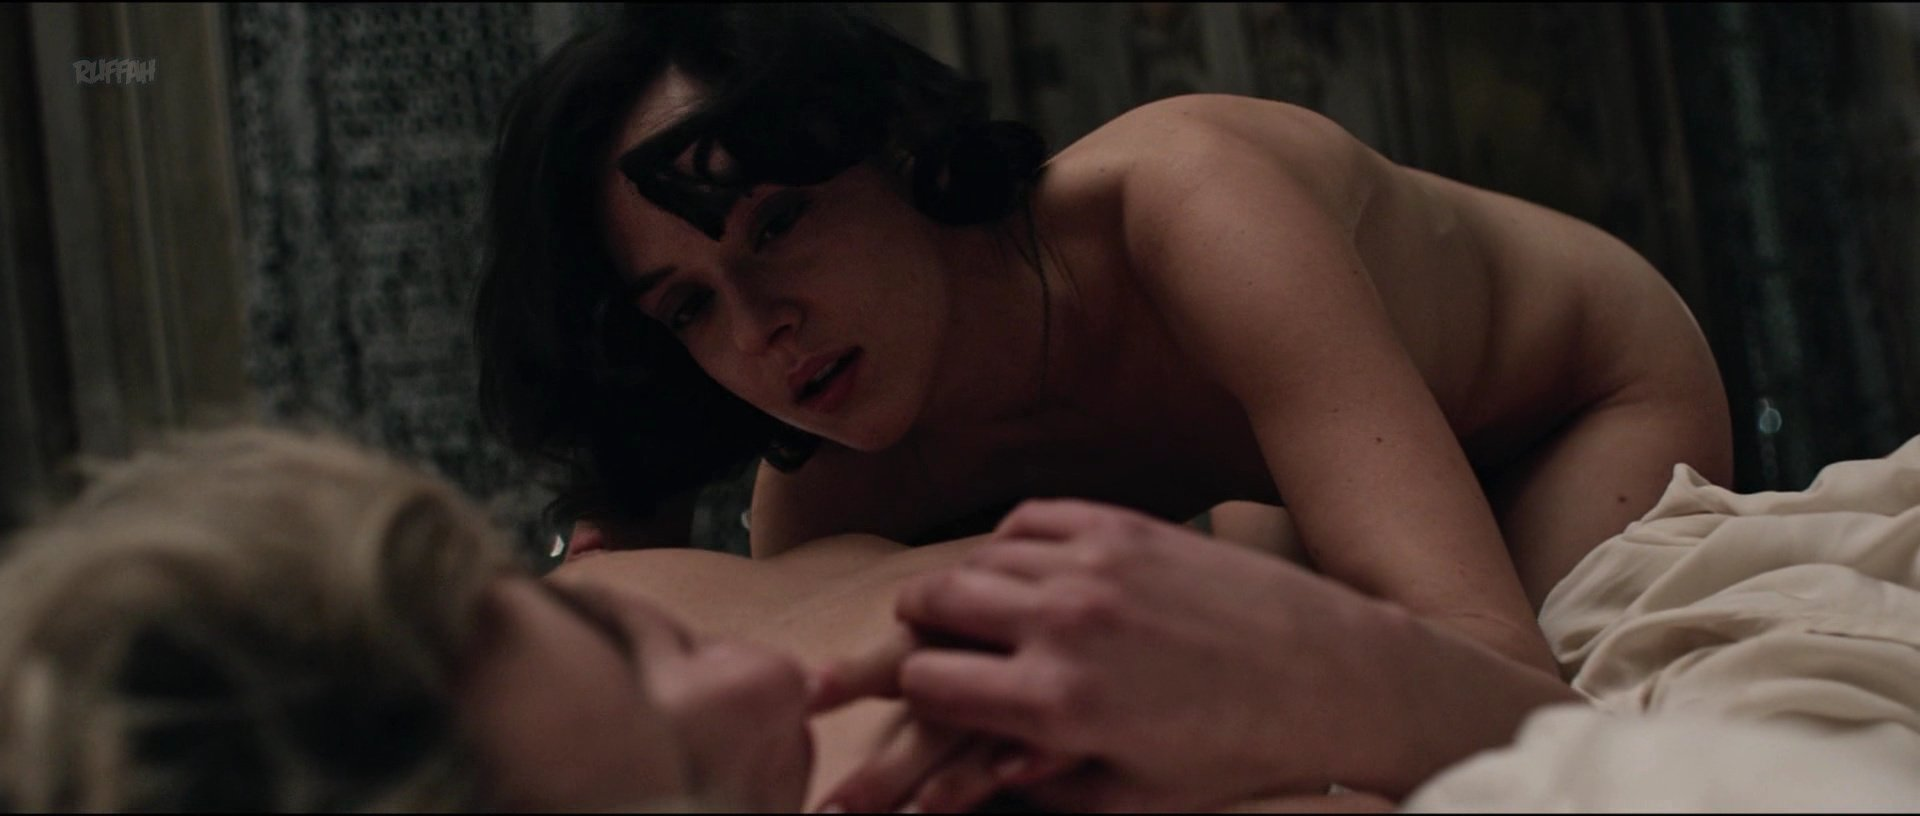 Analeigh Tipton Sex nude video celebs » marta gastini nude, analeigh tipton nude